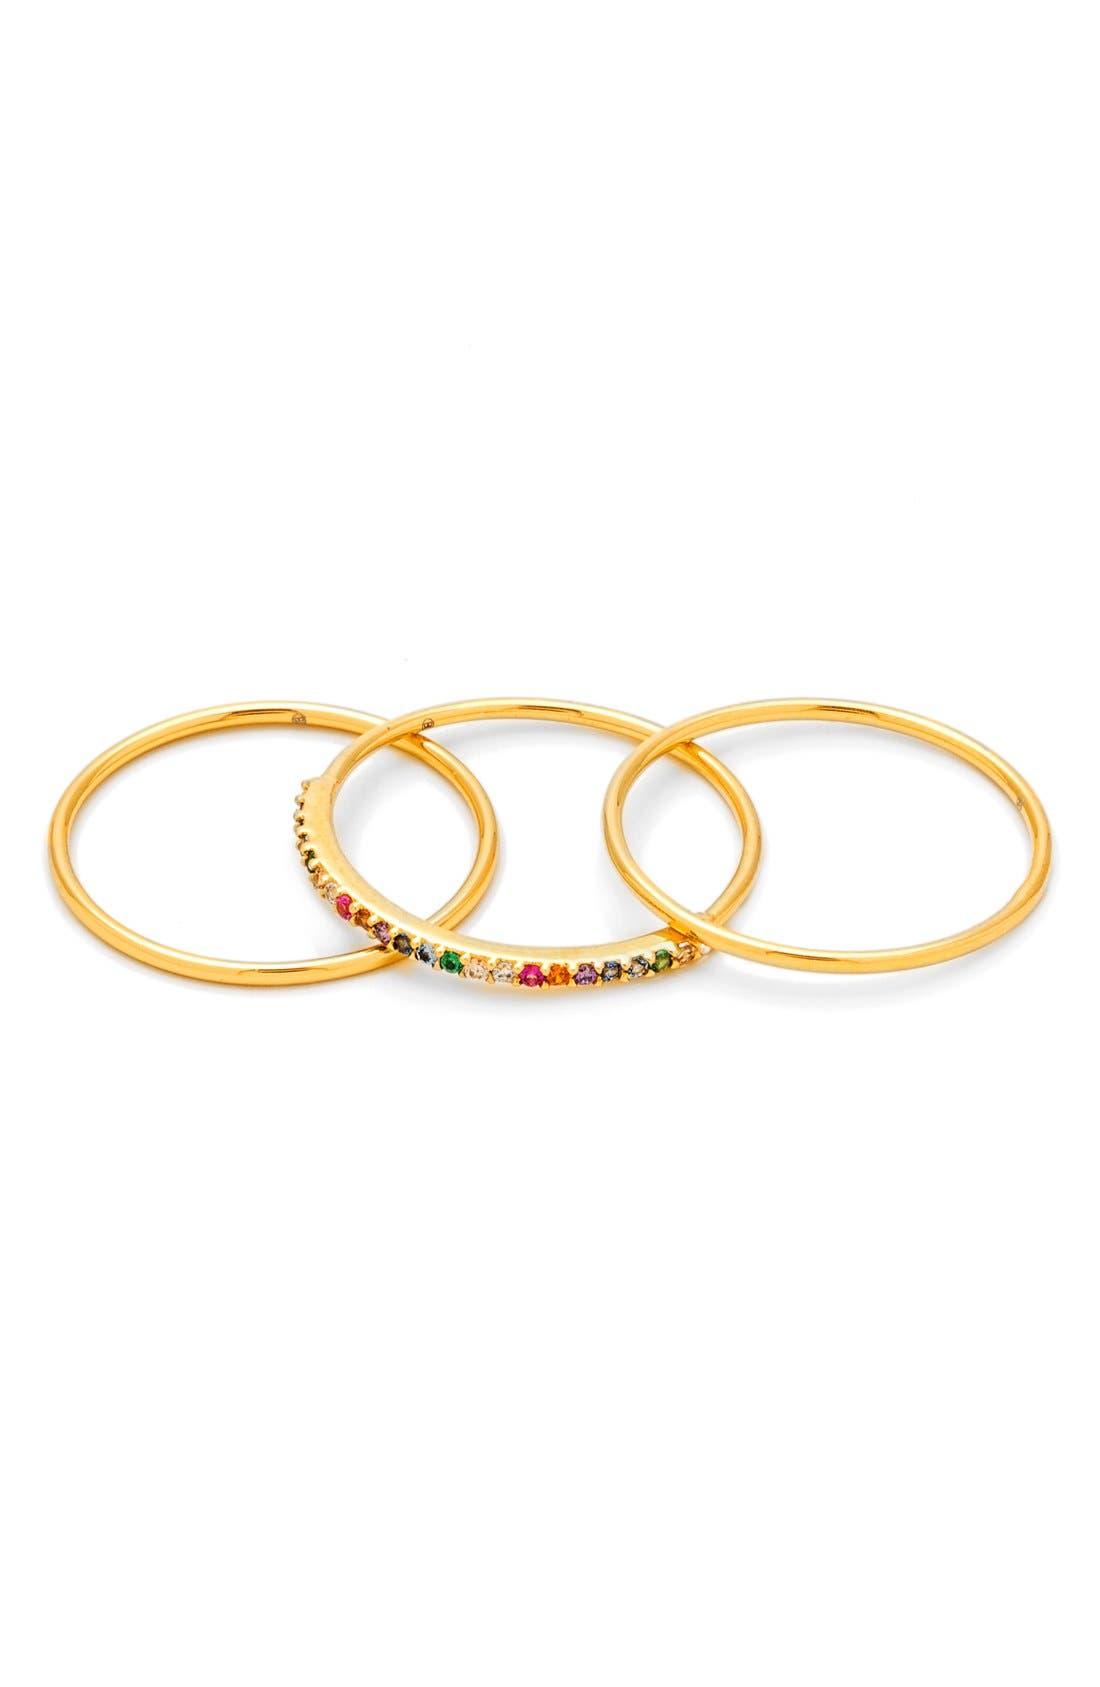 Main Image - gorjana Shimmer Stackable Set of 3 Band Rings